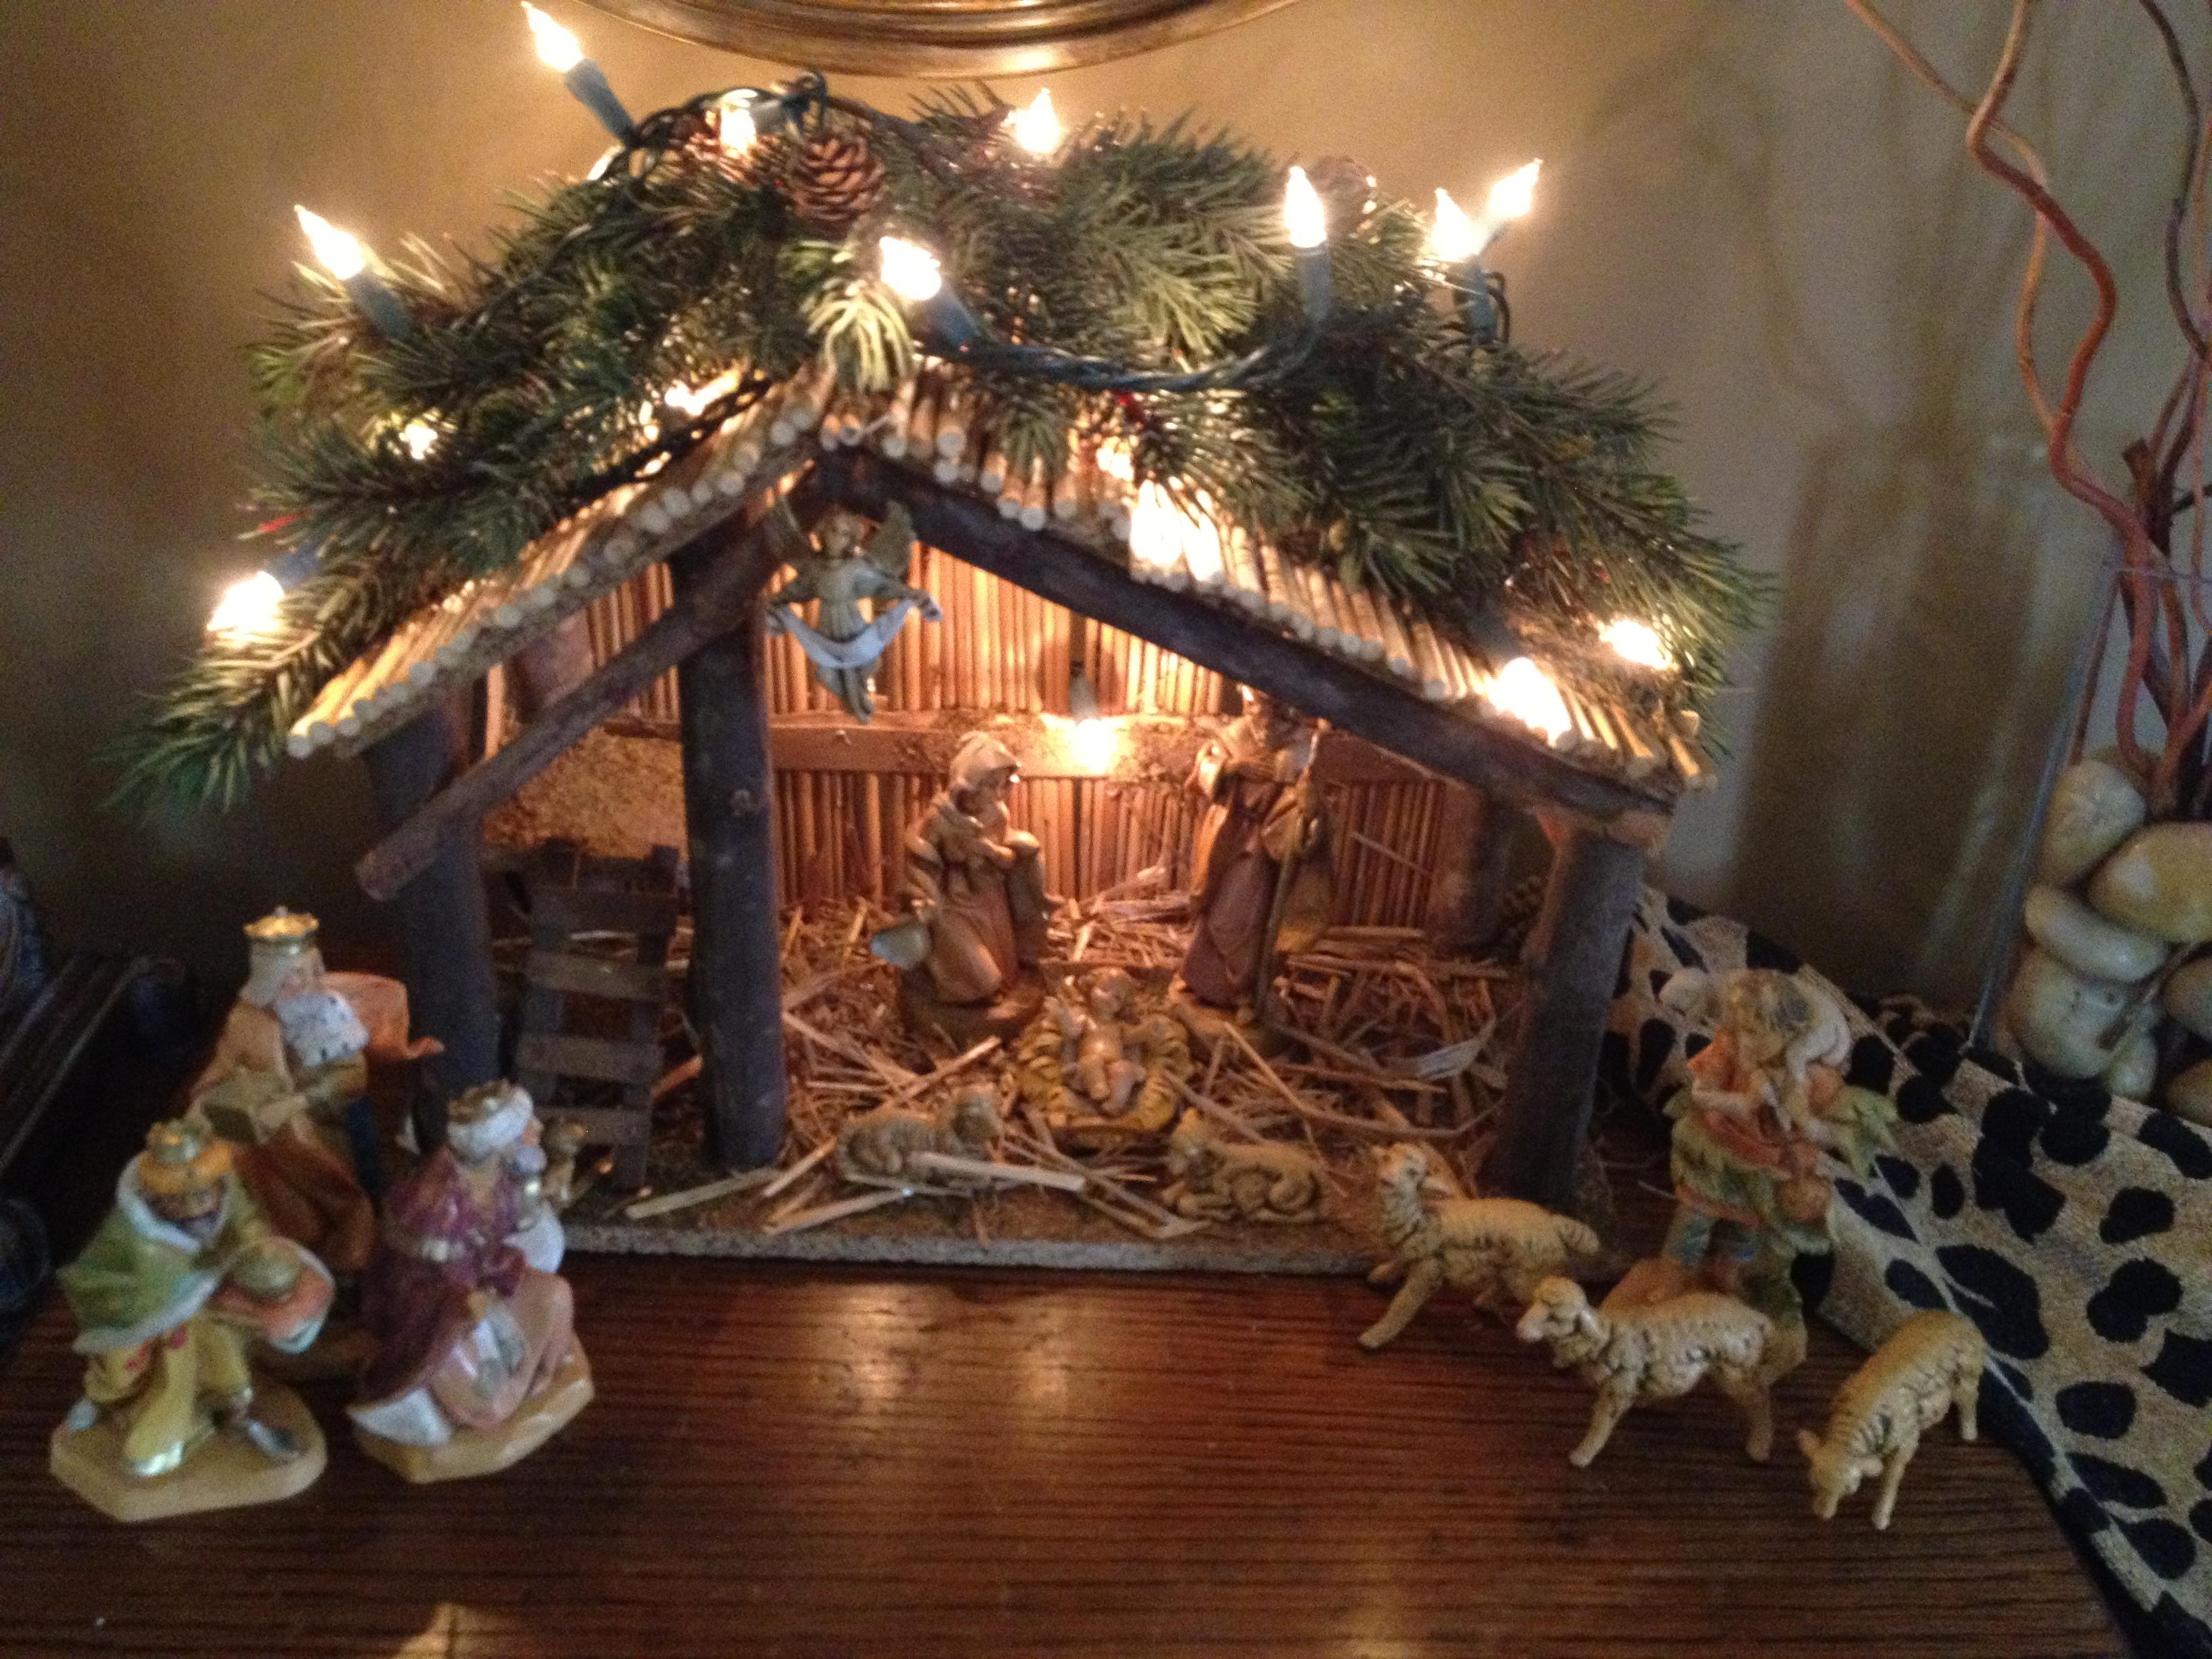 Creche Nativity Scenes And Art Of The Nativity The Cardinal